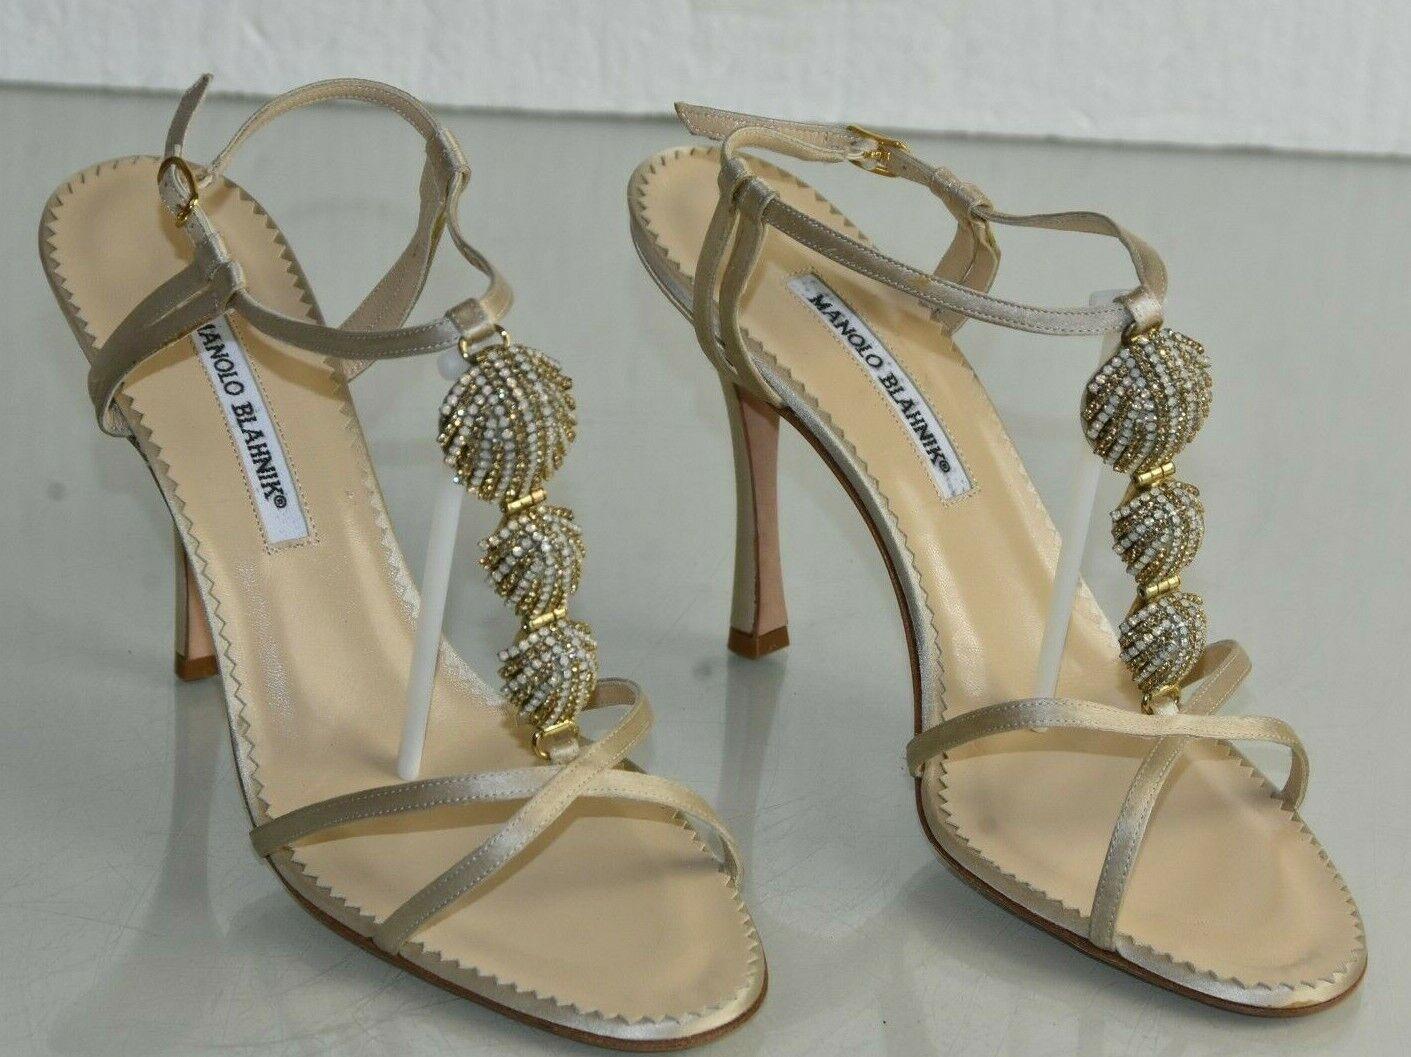 Neu Manolo Blahnik Champagner Satin Jeweled Sandalen Nude Riemchen Schuhe 41.5